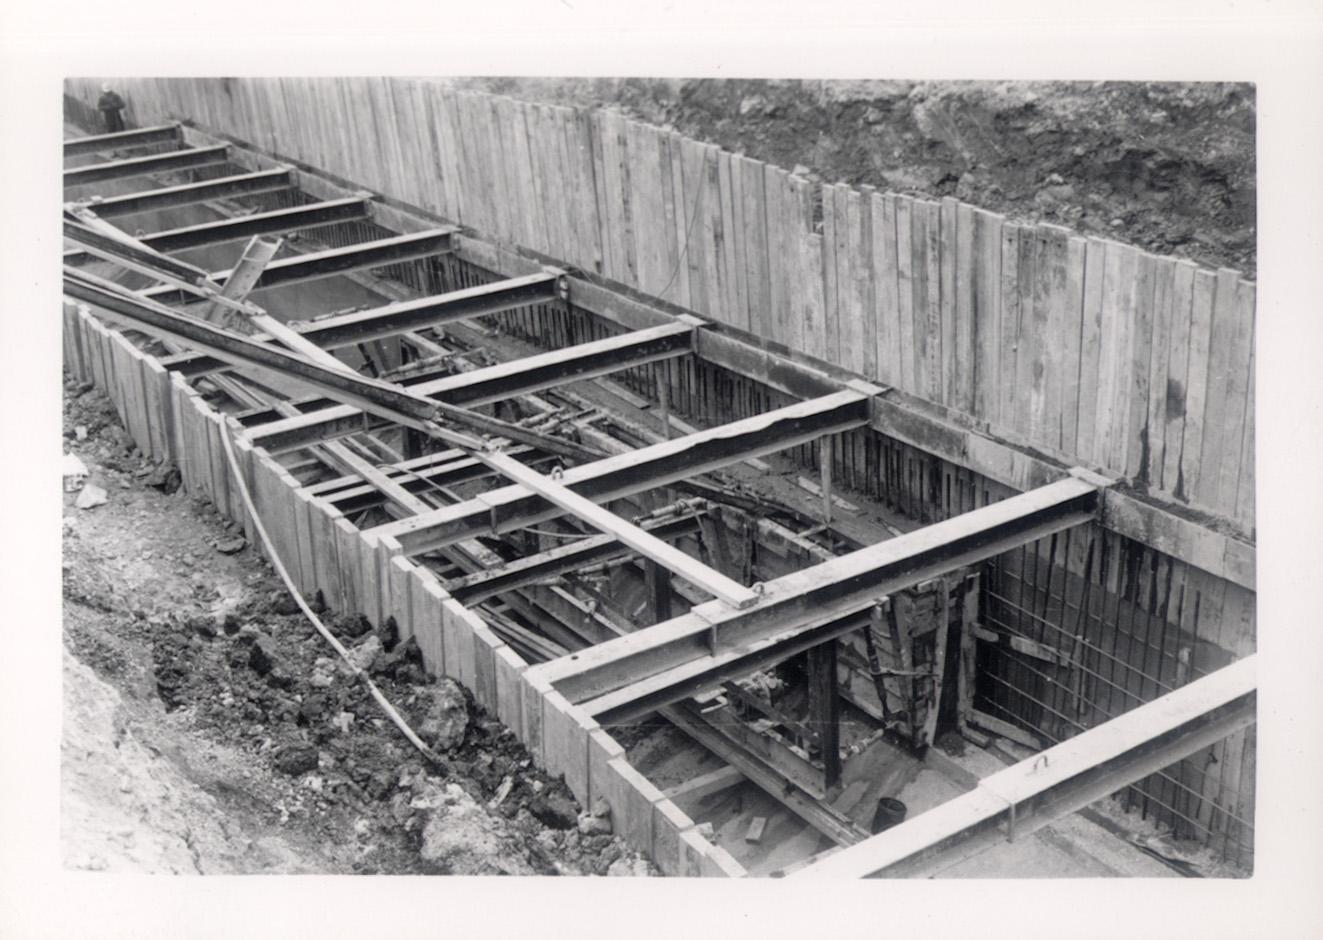 49th Street near La Crosse Avenue, sewer construction, March 14, 1958